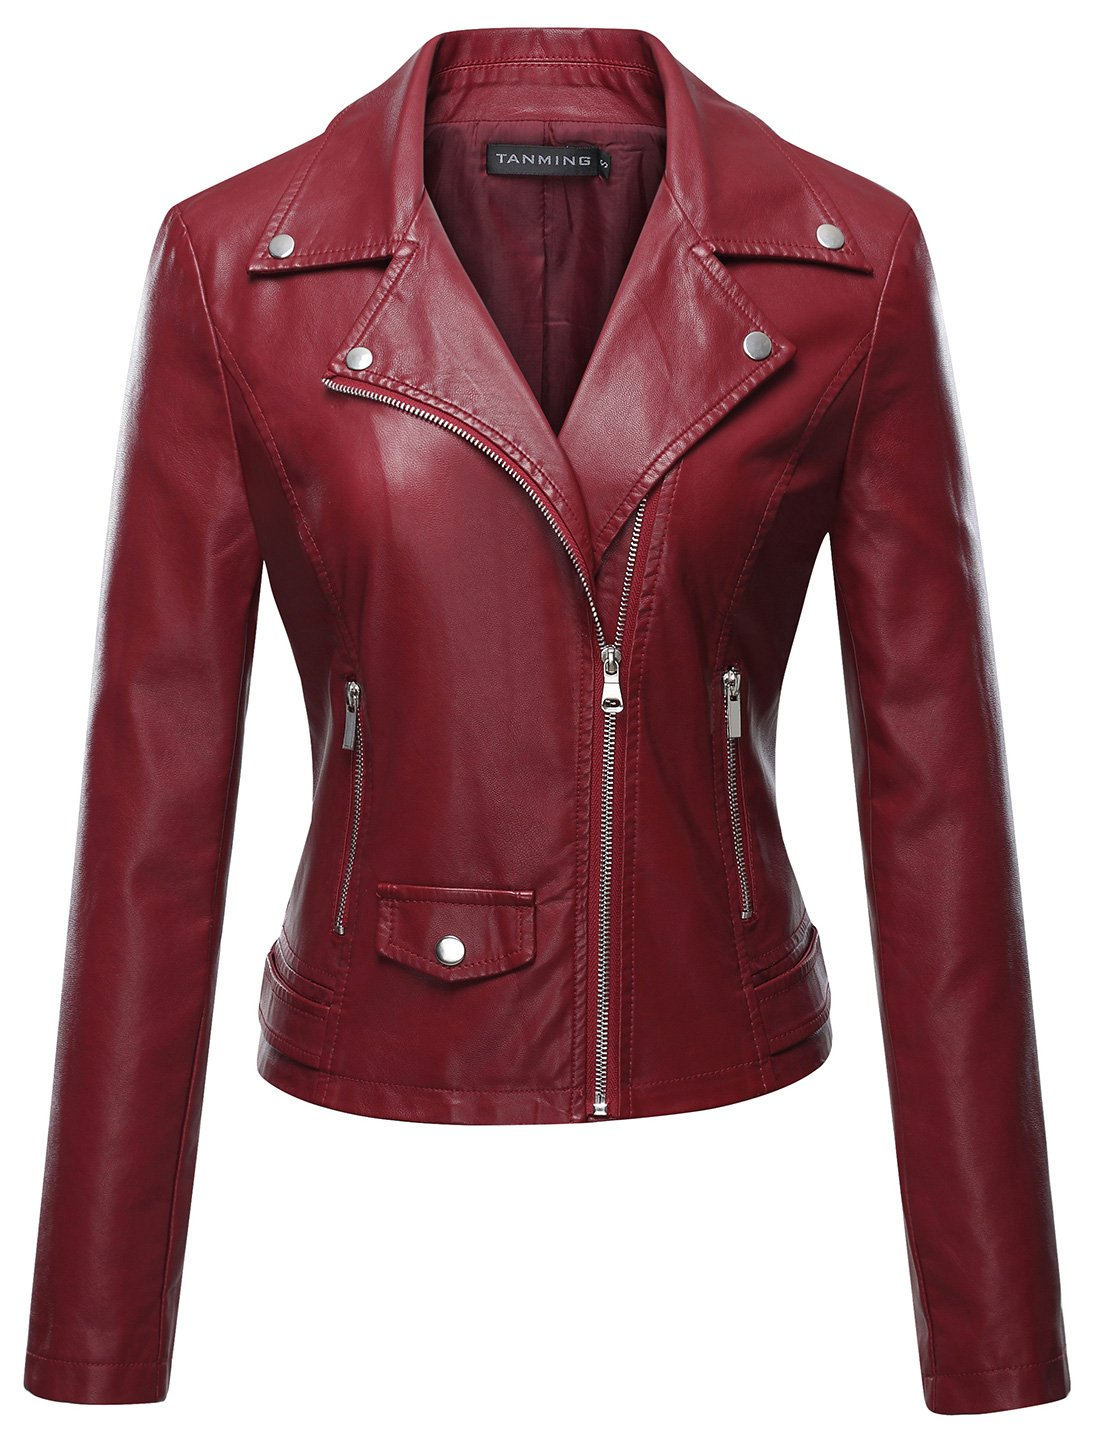 Tanming Women's Faux Leather Moto Biker Short Coat Jacket (Medium, Wine Red)